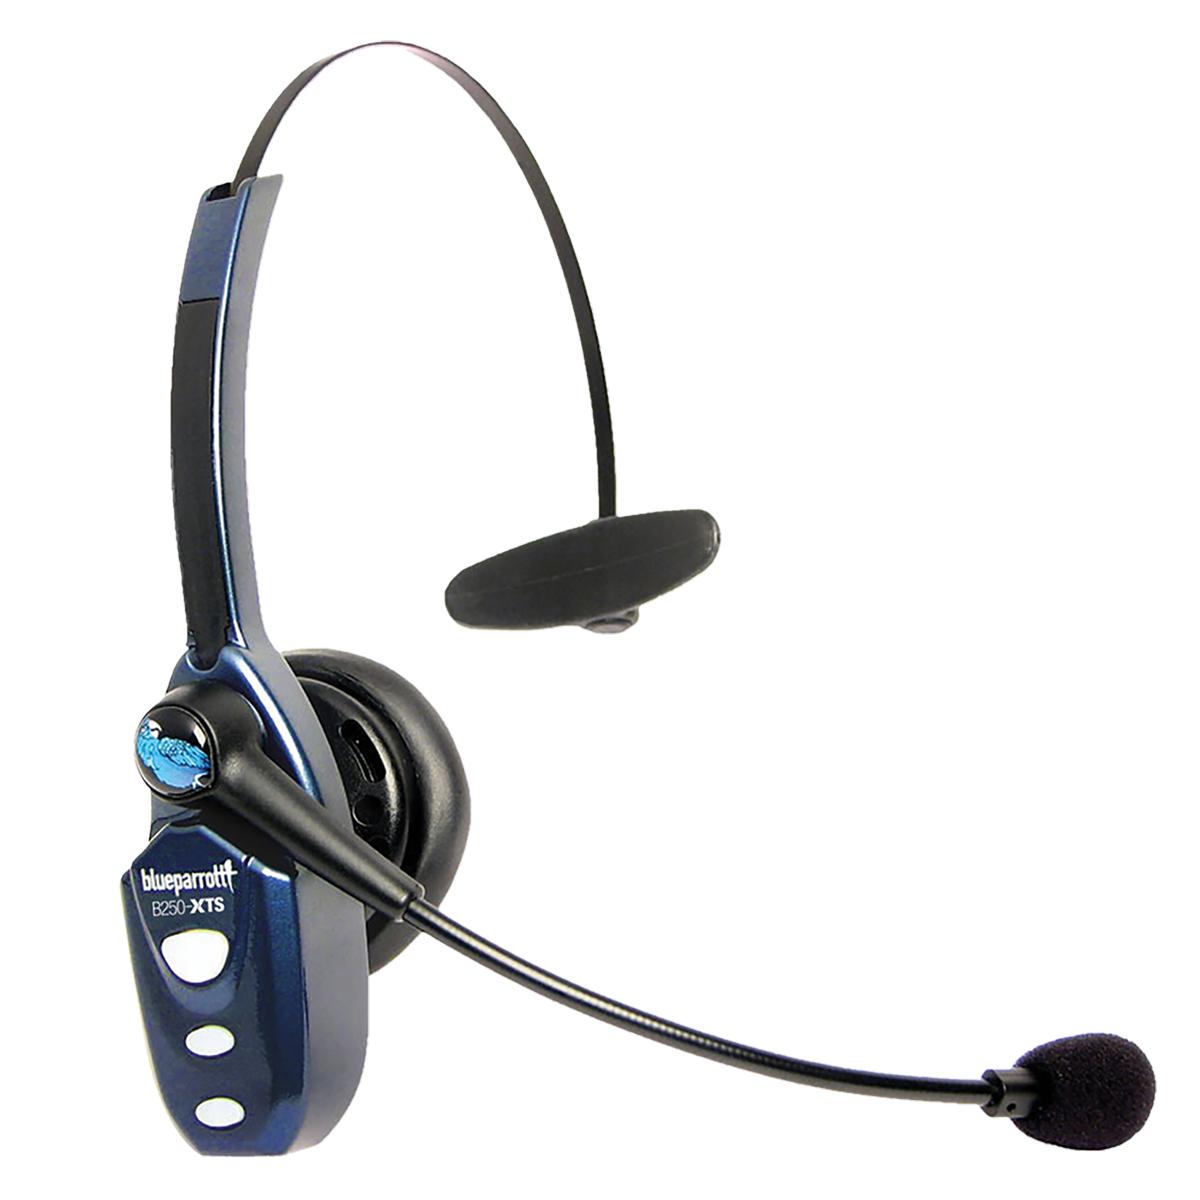 Blueparrott B250-XTS Mono Bluetooth Headset